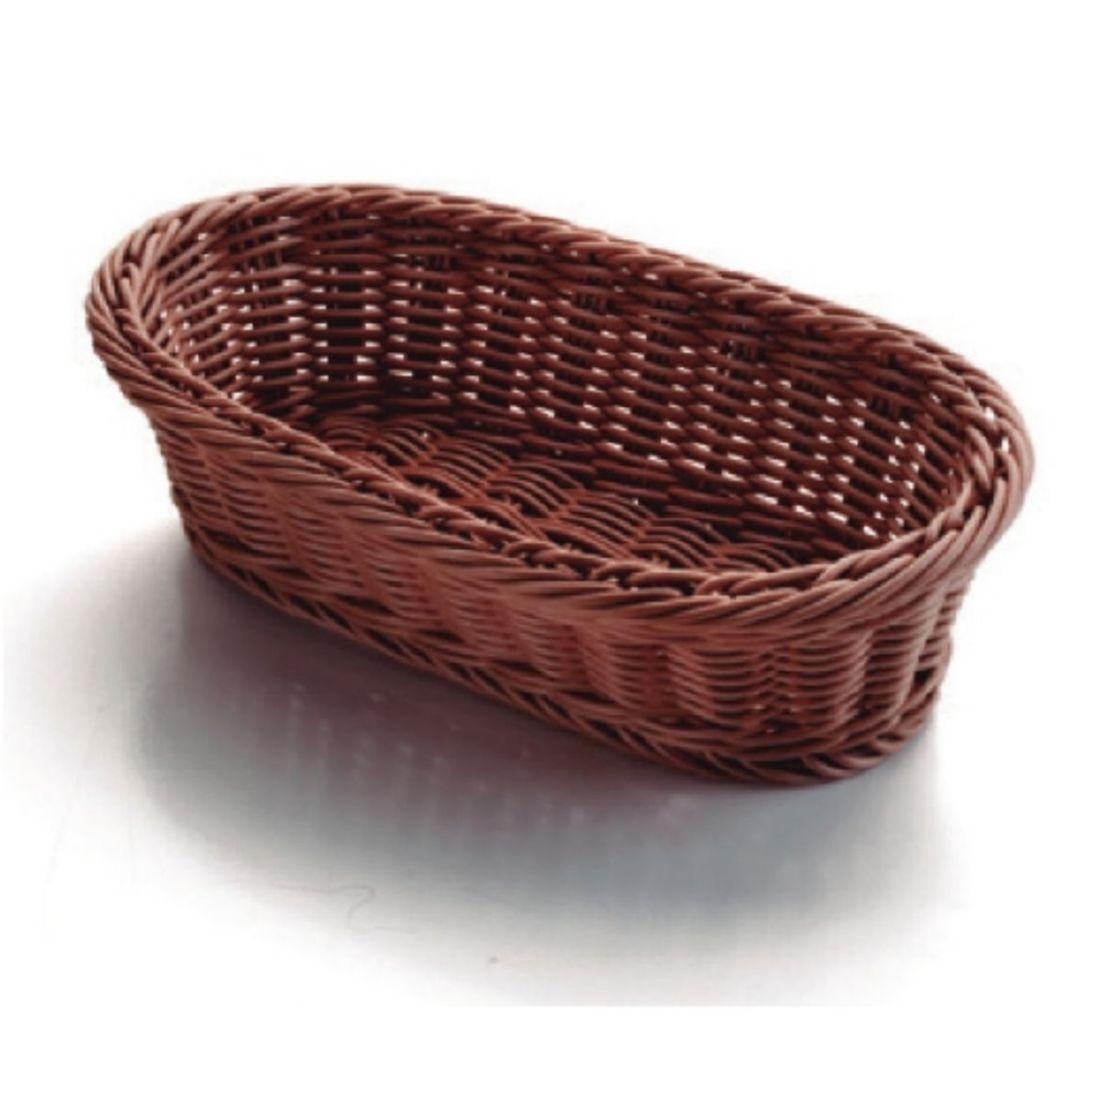 Košík na pečivo polypropylen - oválný, tmavý